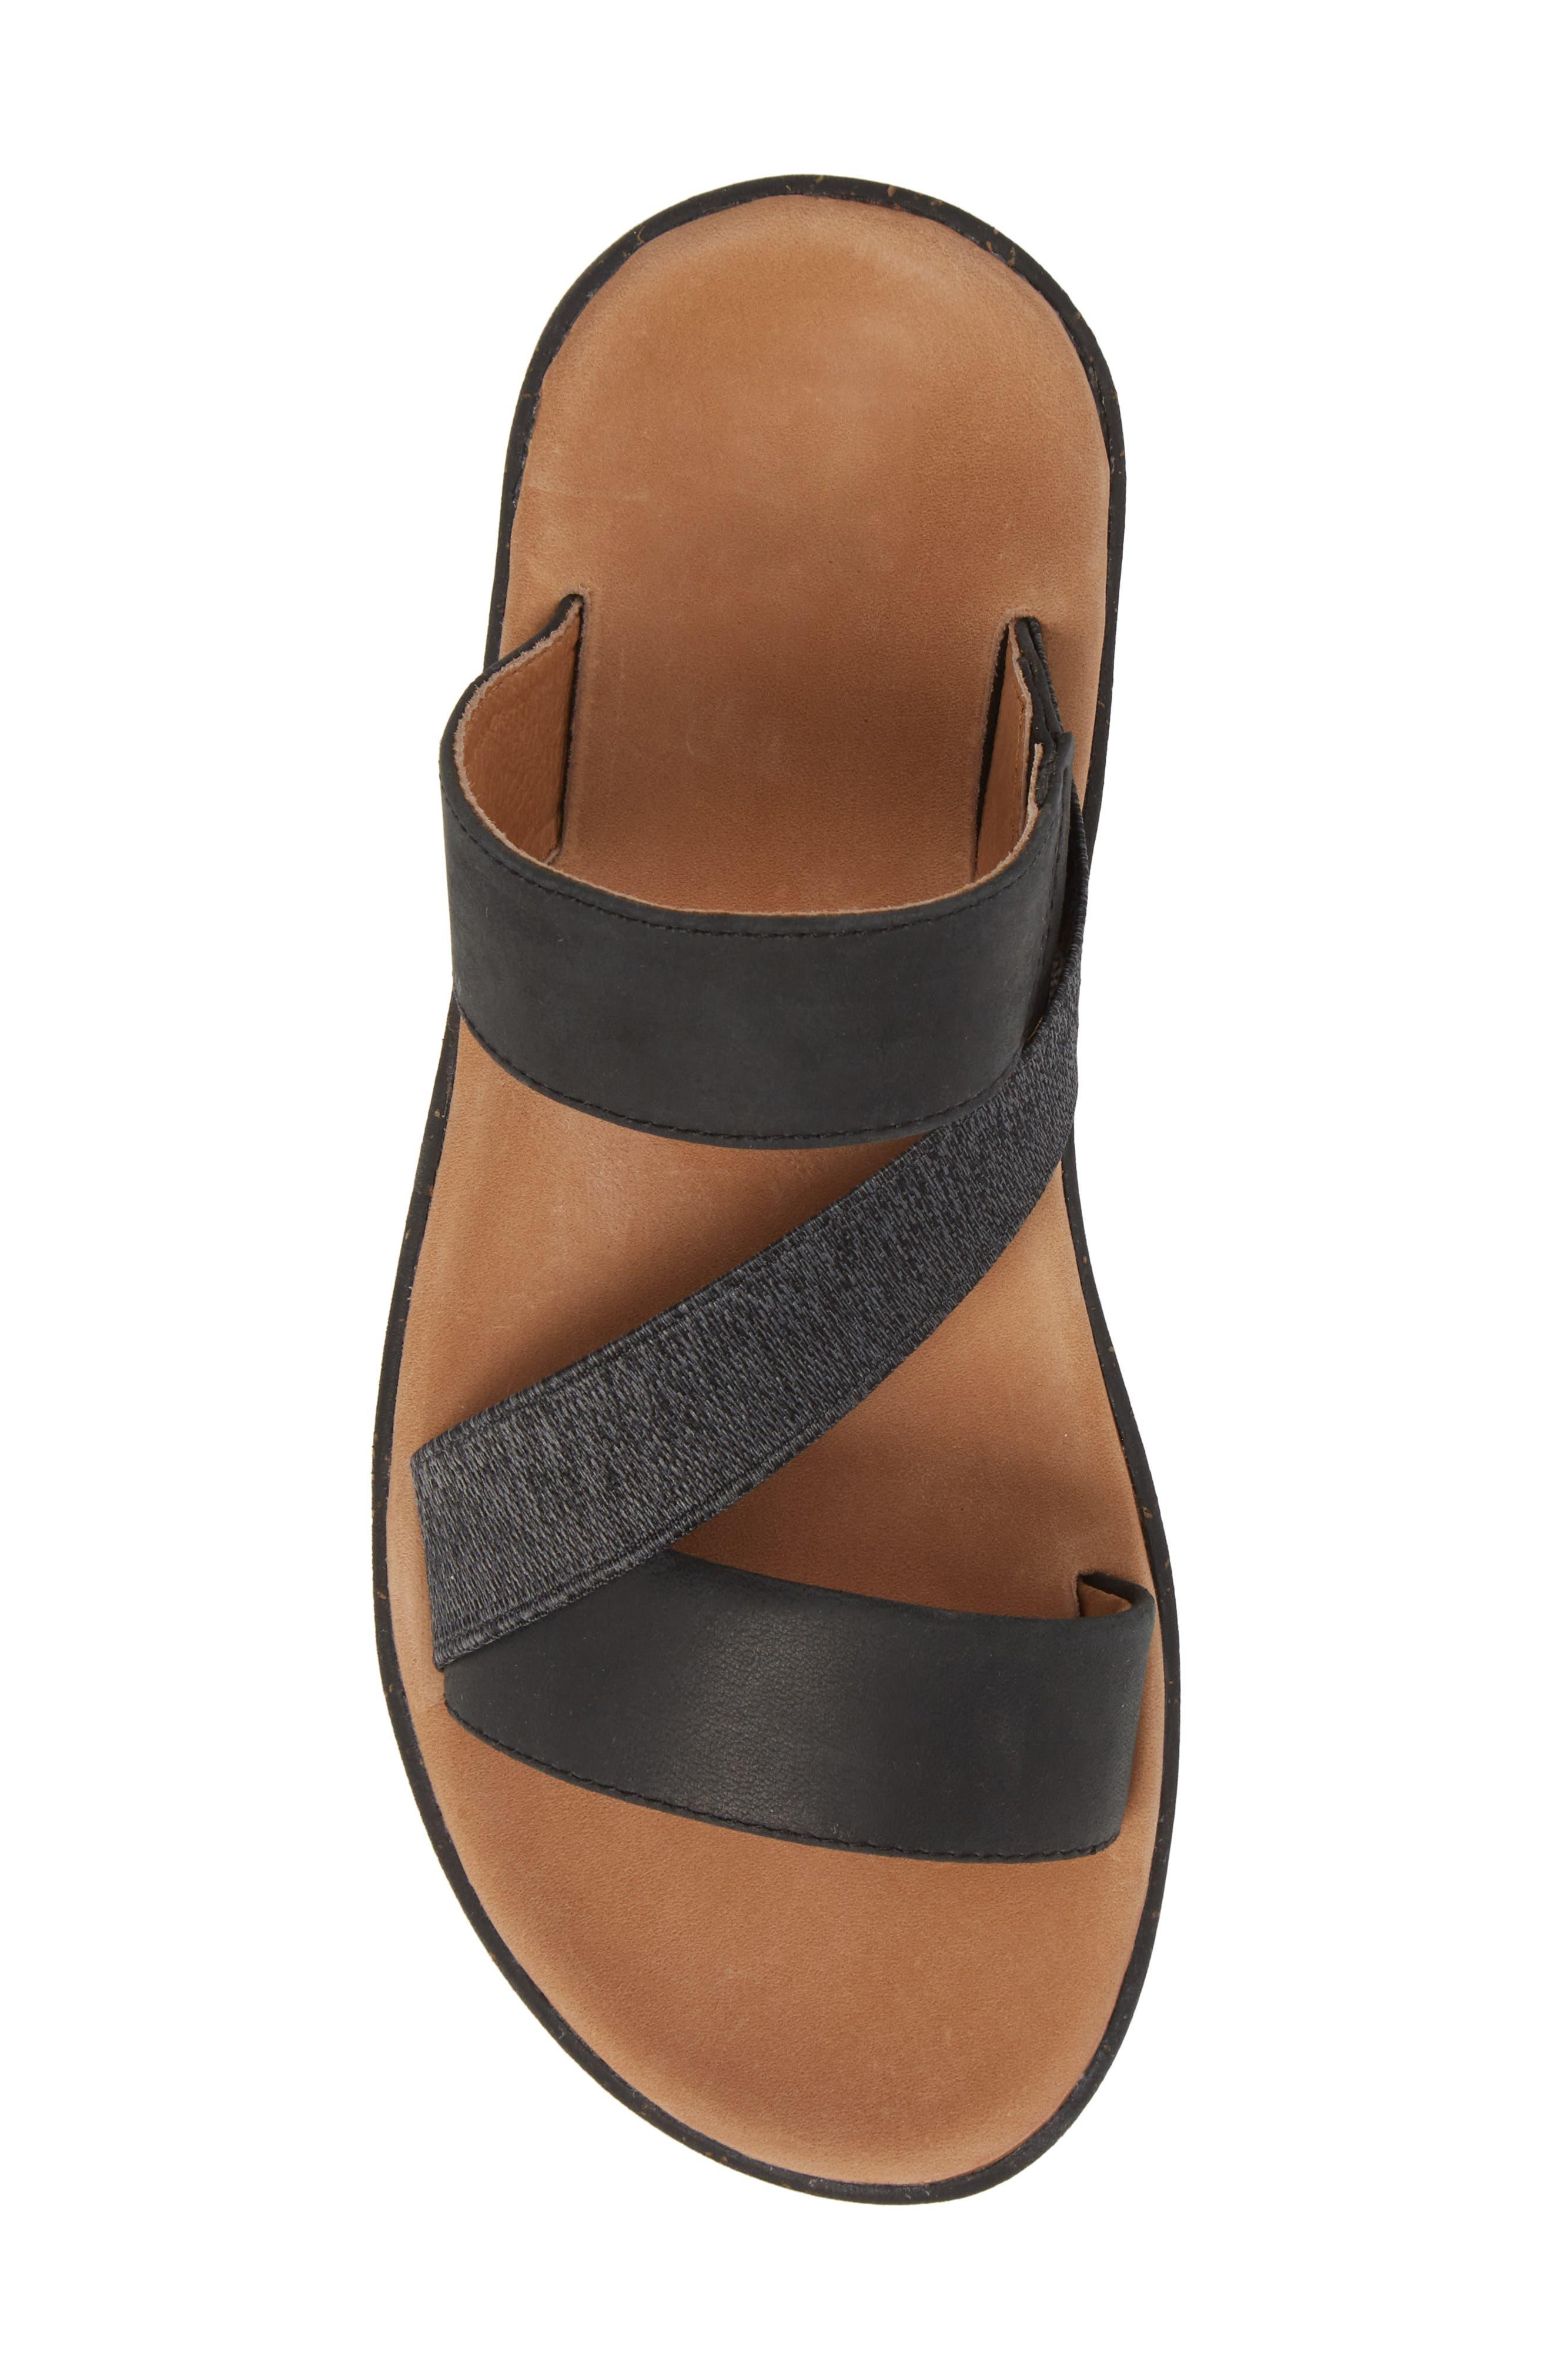 Reyes Slide Sandal,                             Alternate thumbnail 5, color,                             Black Leather